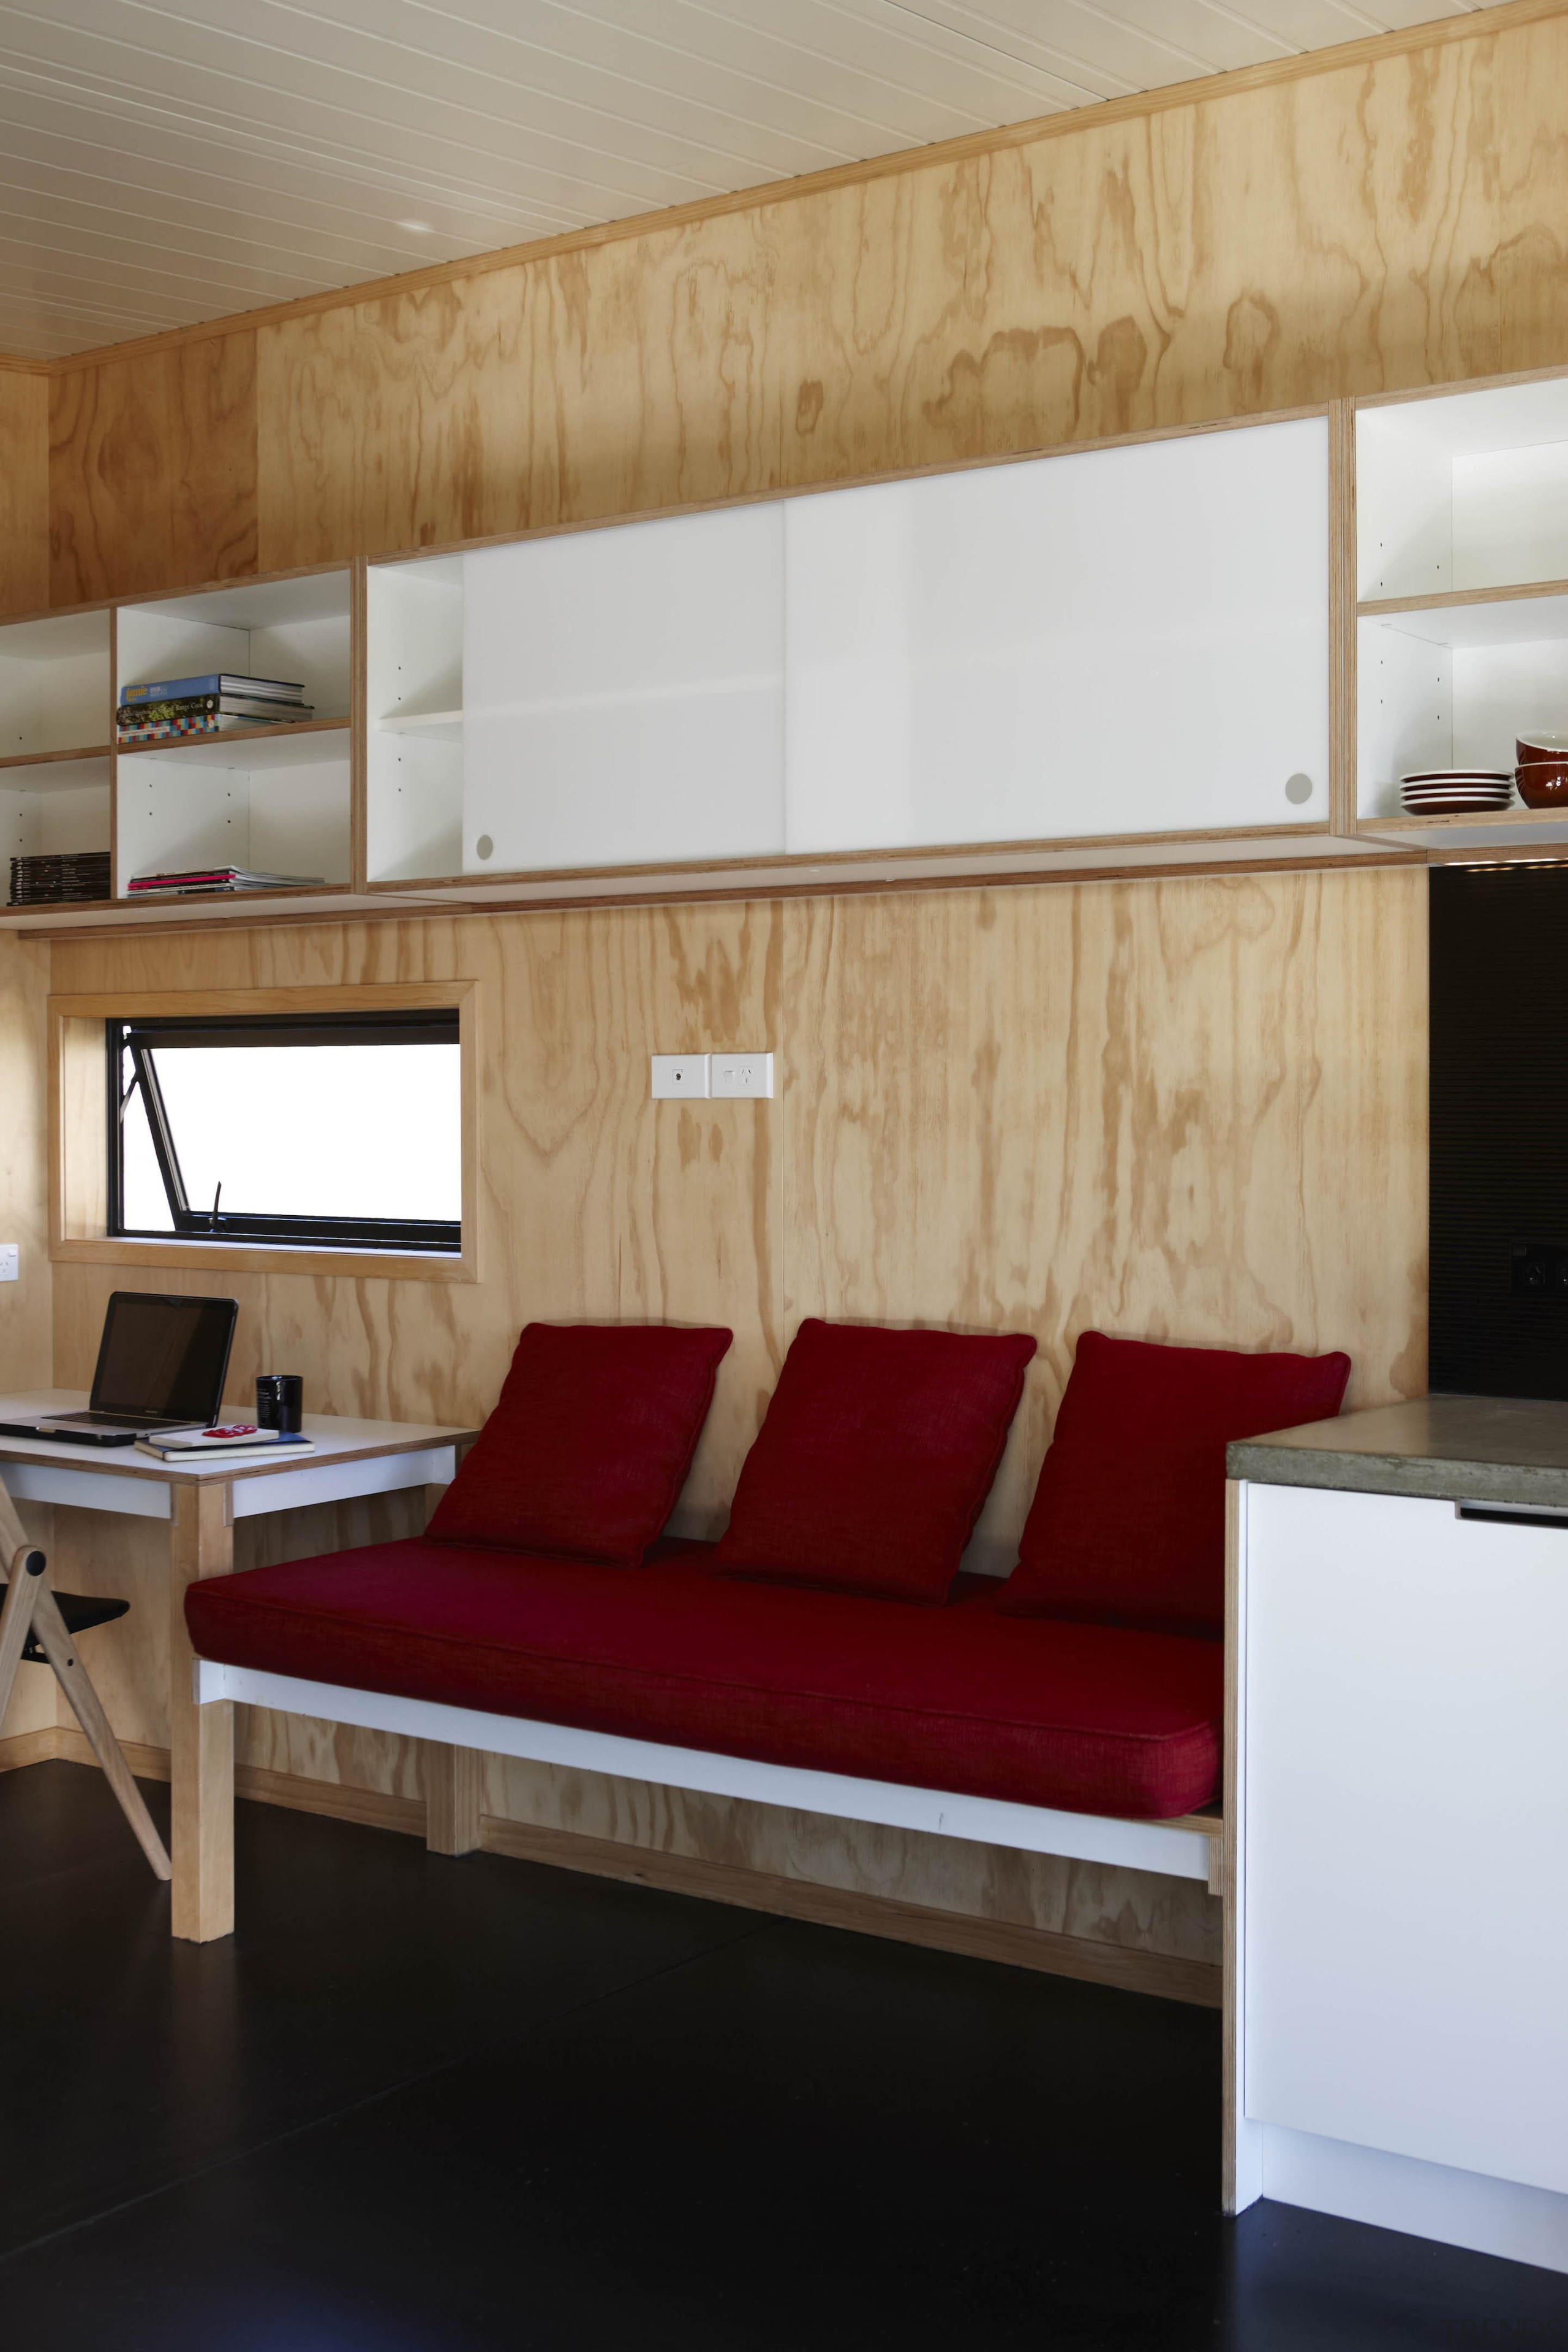 Waitakere Ranges - Studio 19 VisionWest Community Housing bed frame, ceiling, floor, flooring, furniture, interior design, room, table, wall, wood